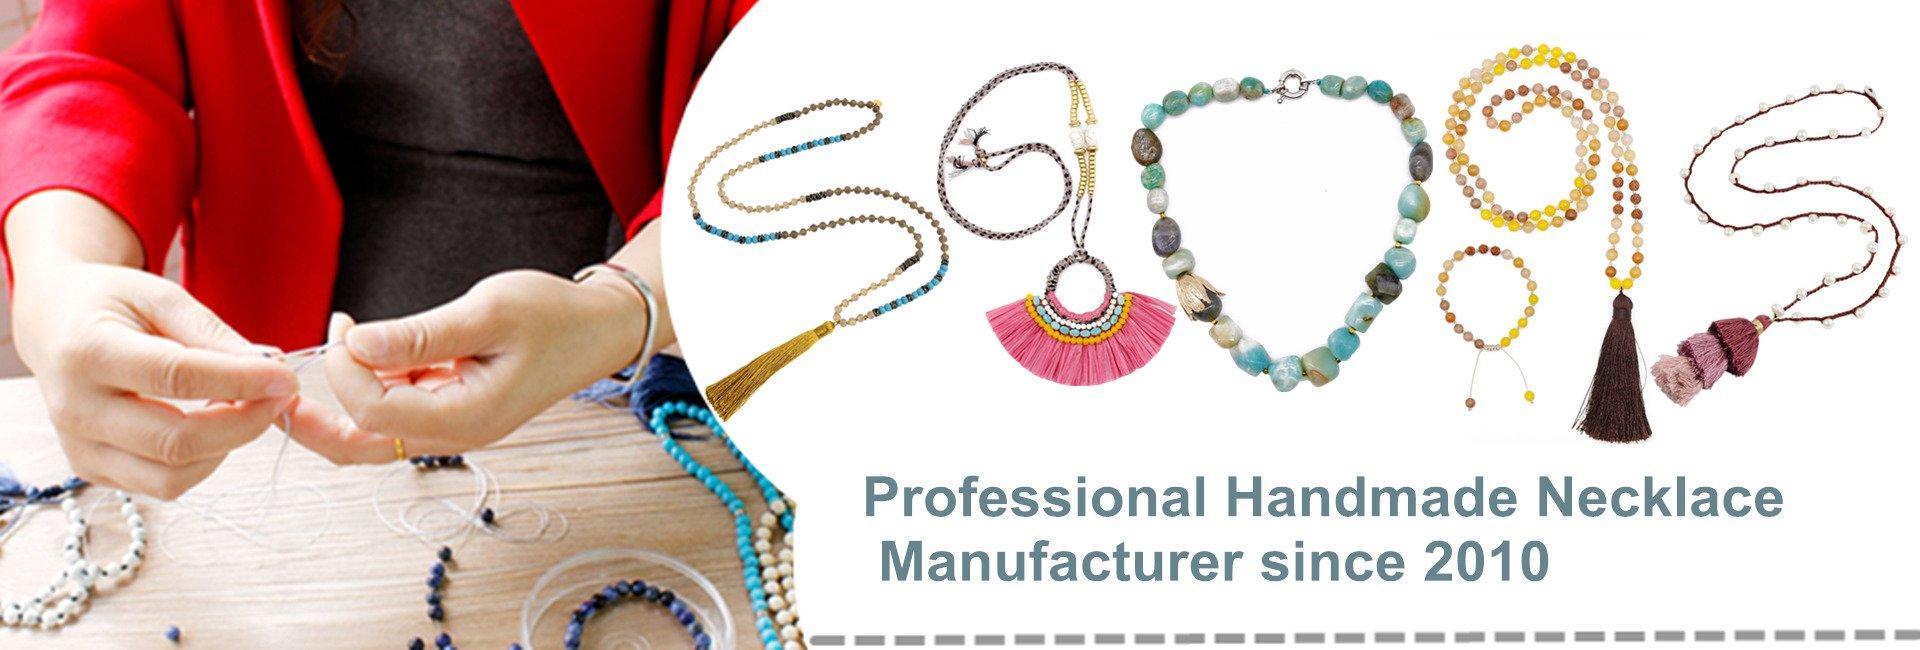 Handmade Necklace Manufacturer